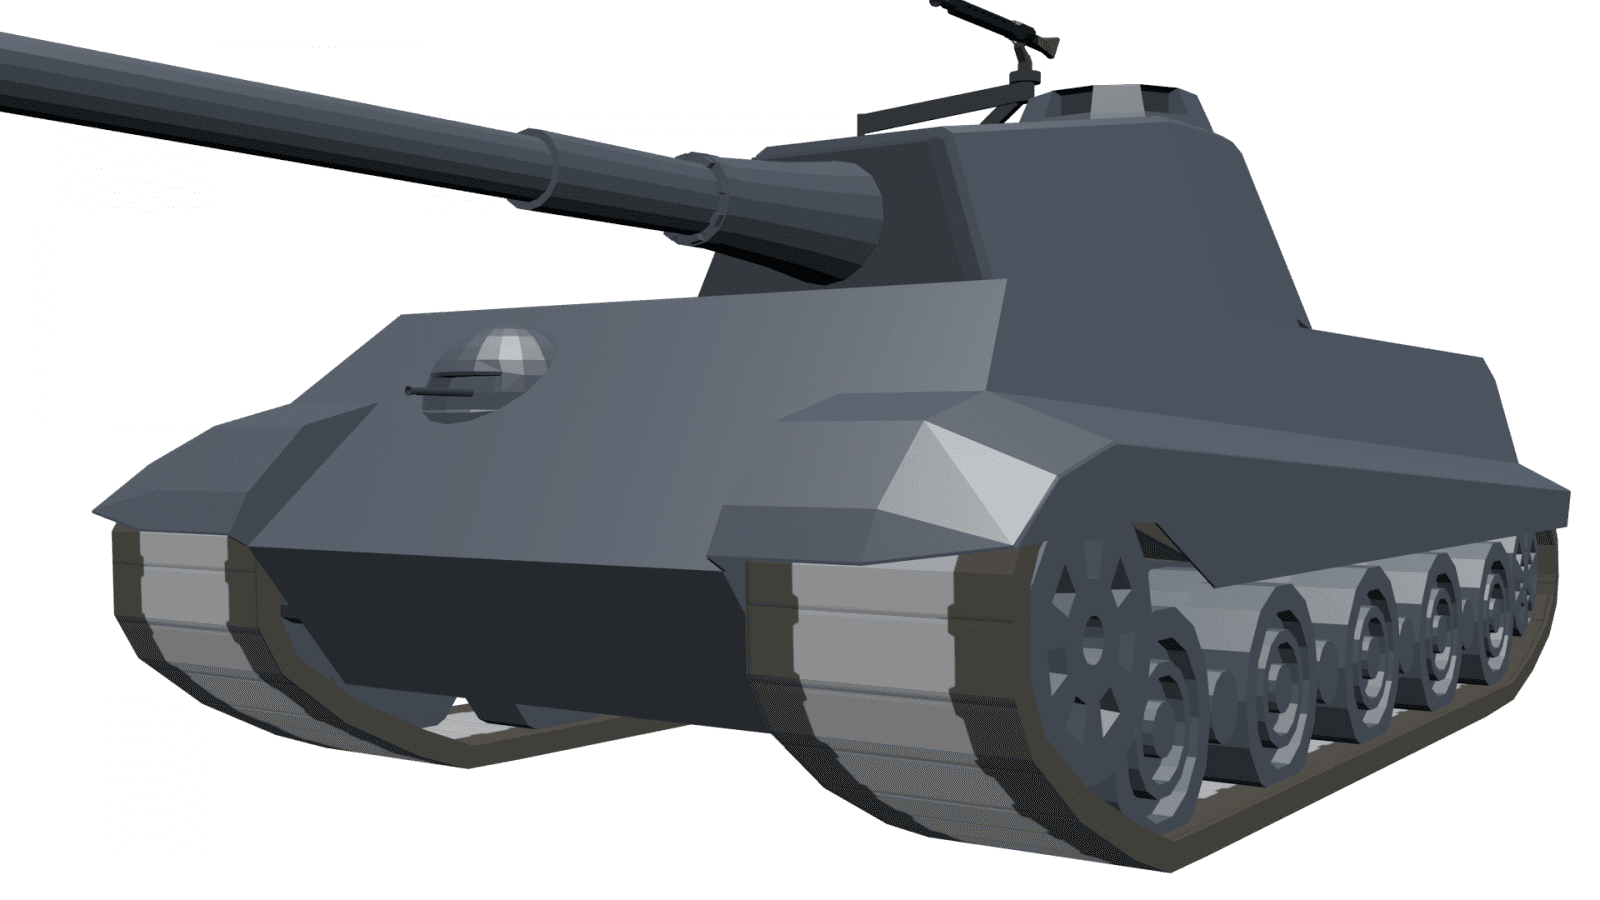 Tiger 2 Mod for Ravenfield